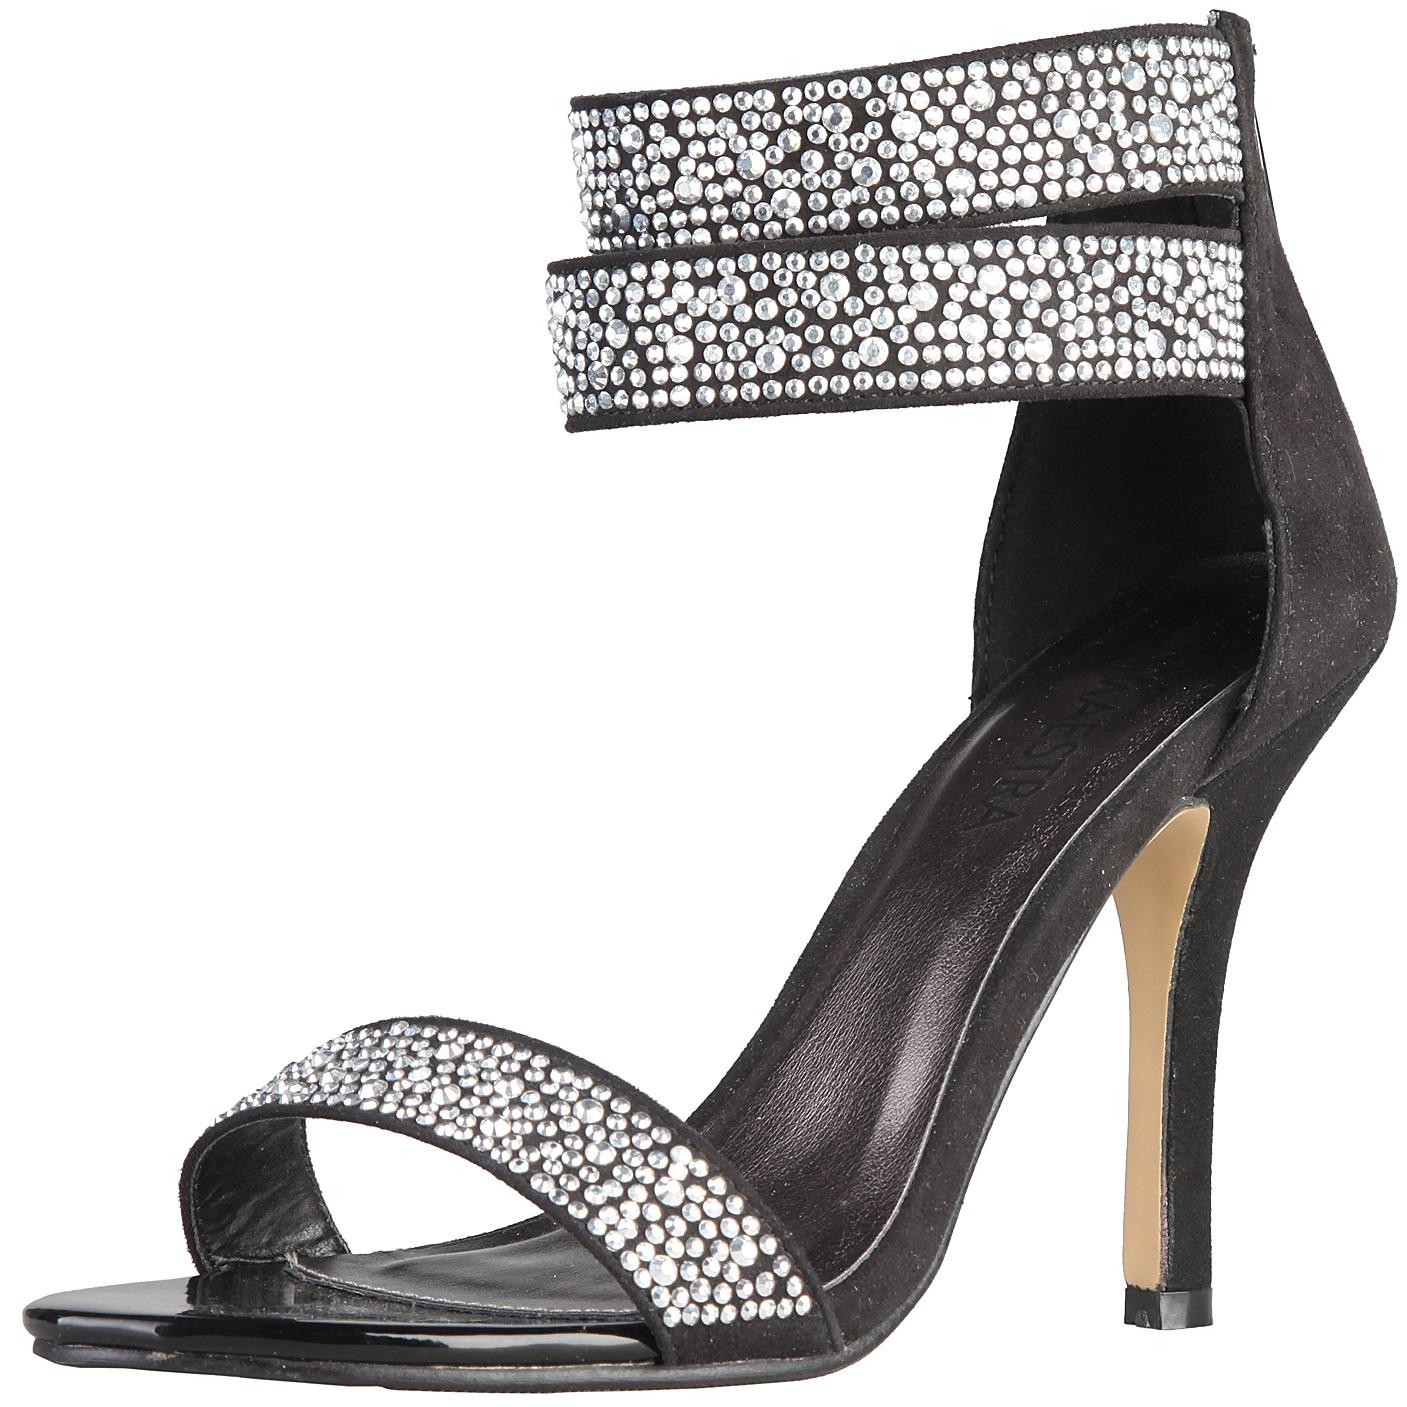 Viamaestra Sandals Nero Rf600173